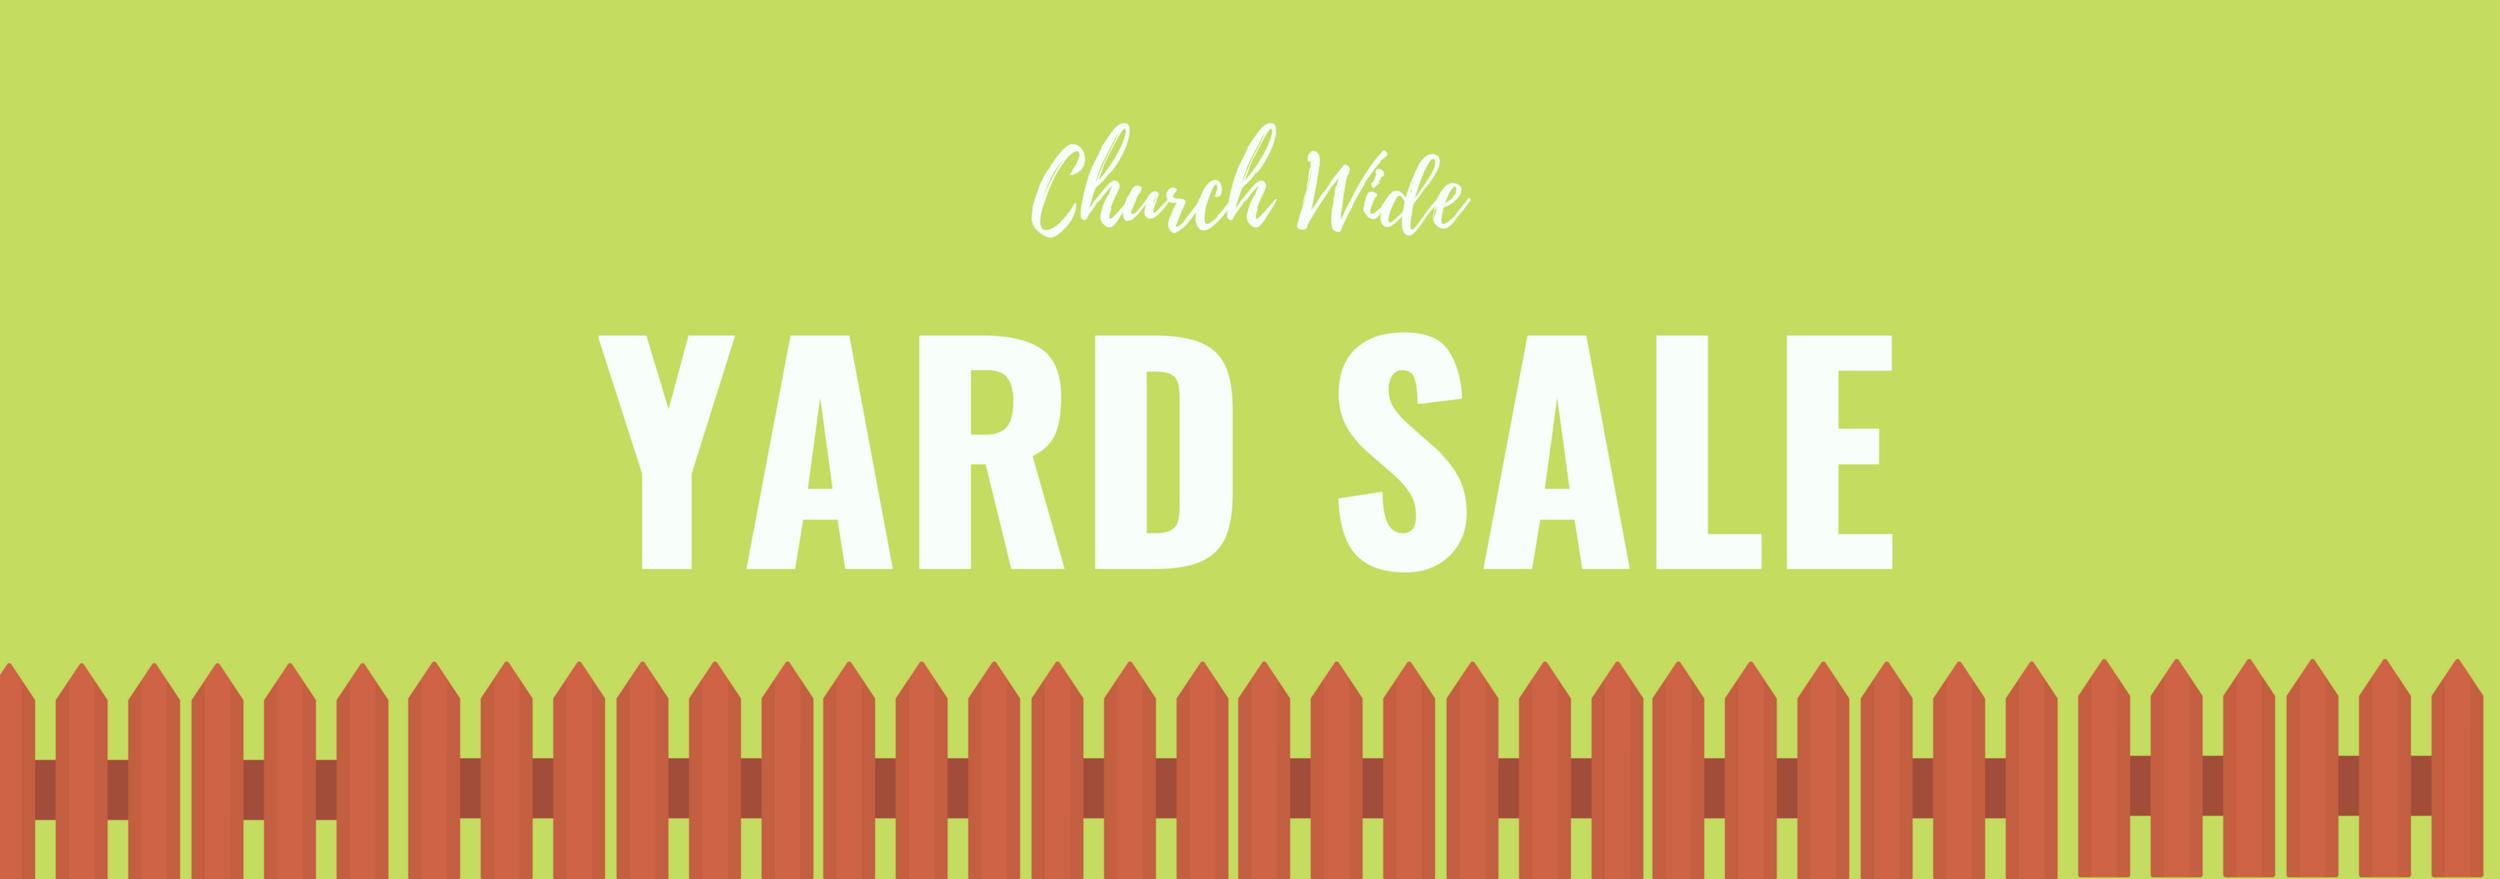 Yard Sale-5.png